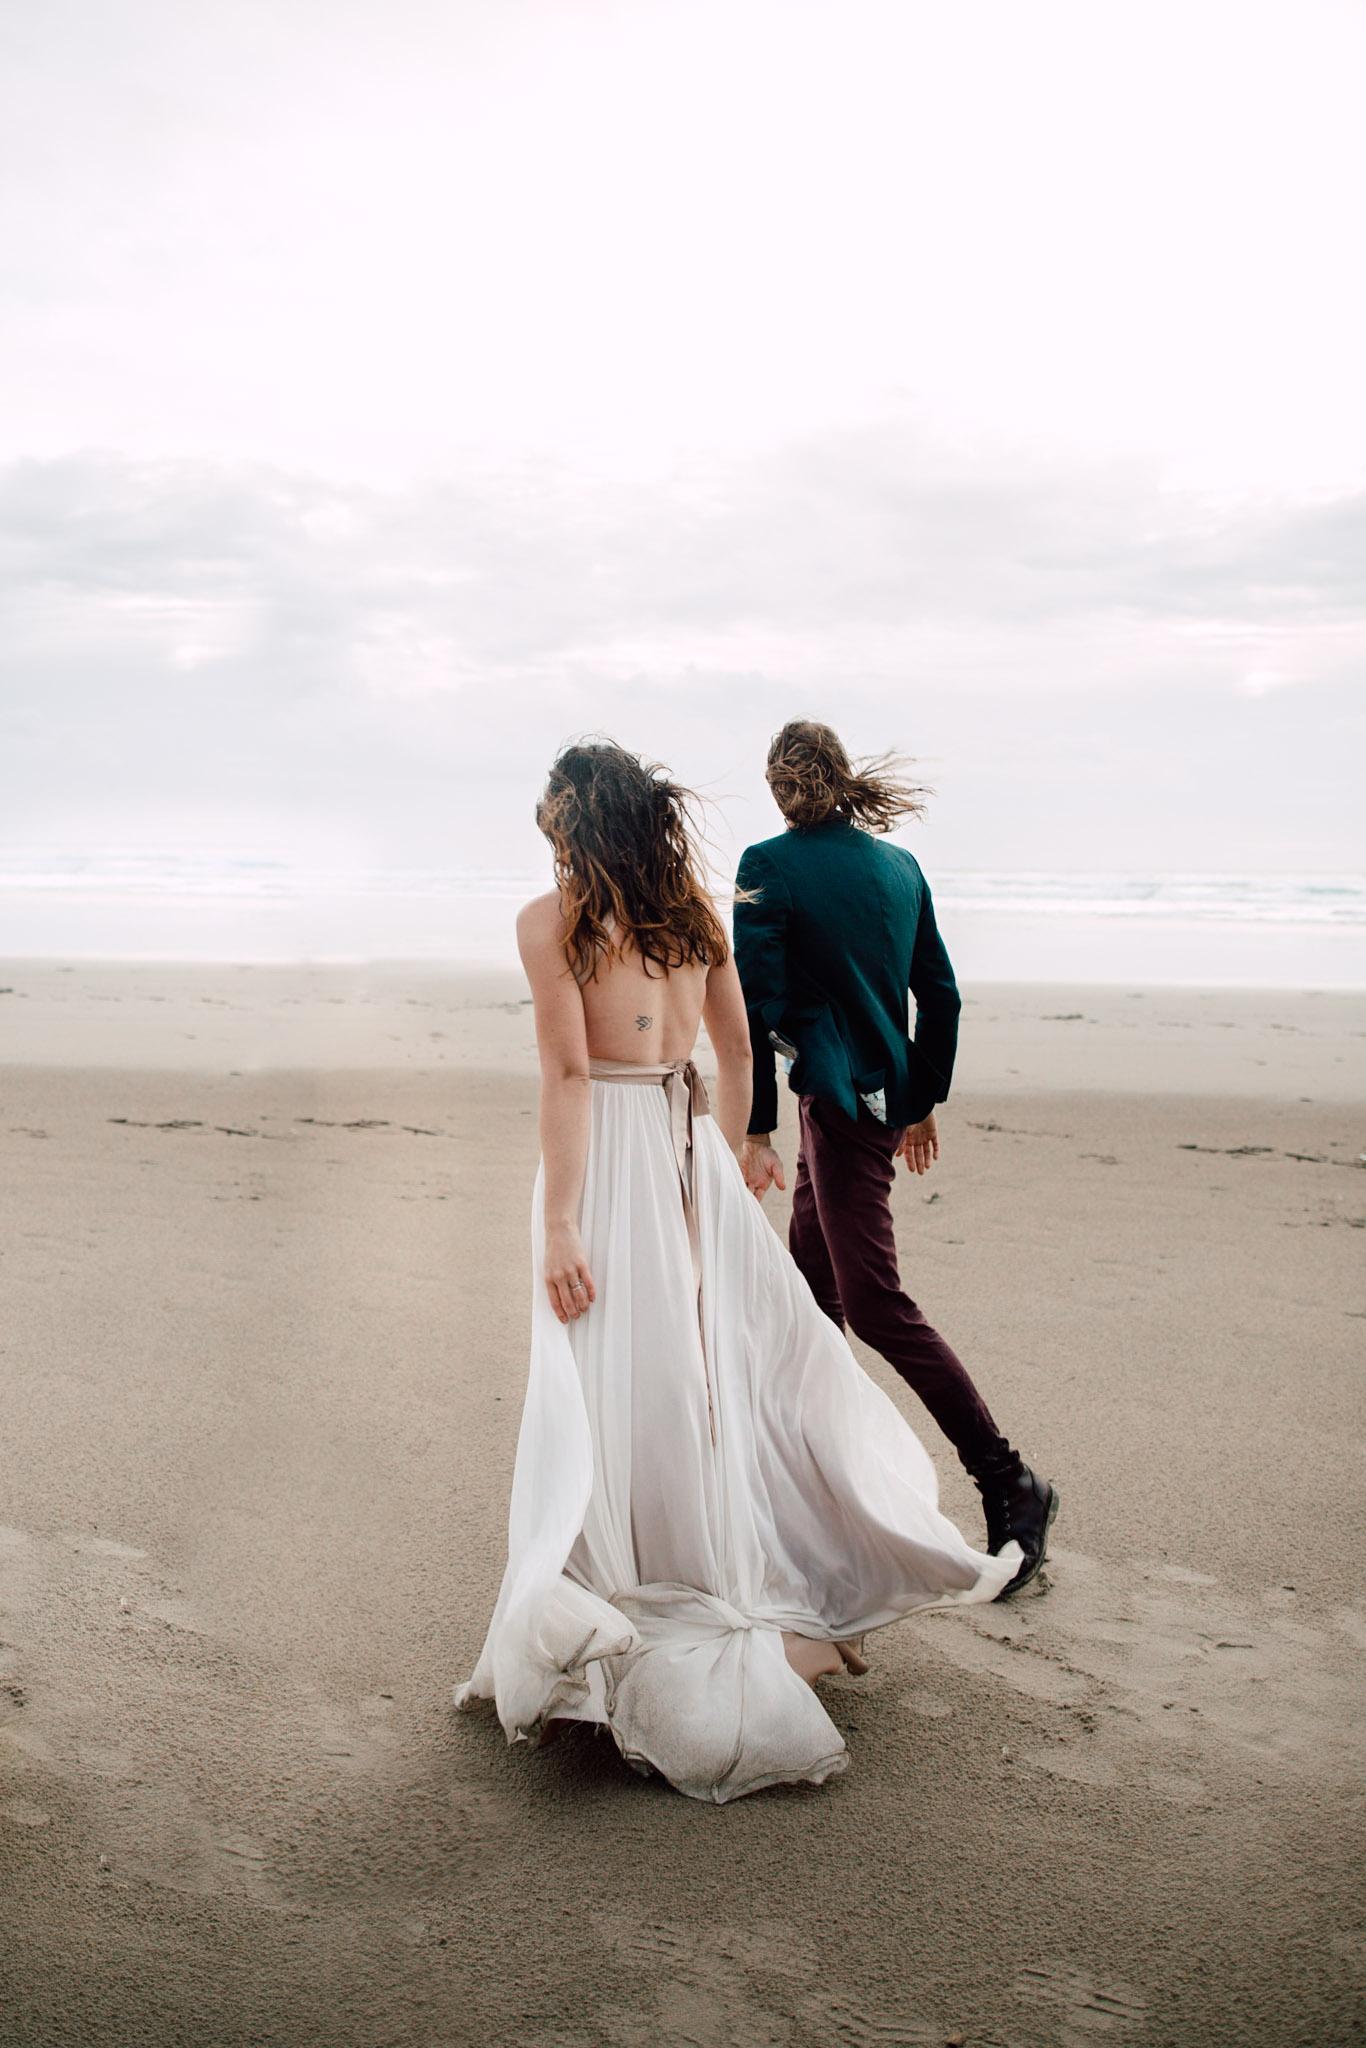 Oregon-Coast-Manzanita-Beach-Engagement-Pia-Anna-Christian-Wedding-Photography-PNW-GB-1.jpg